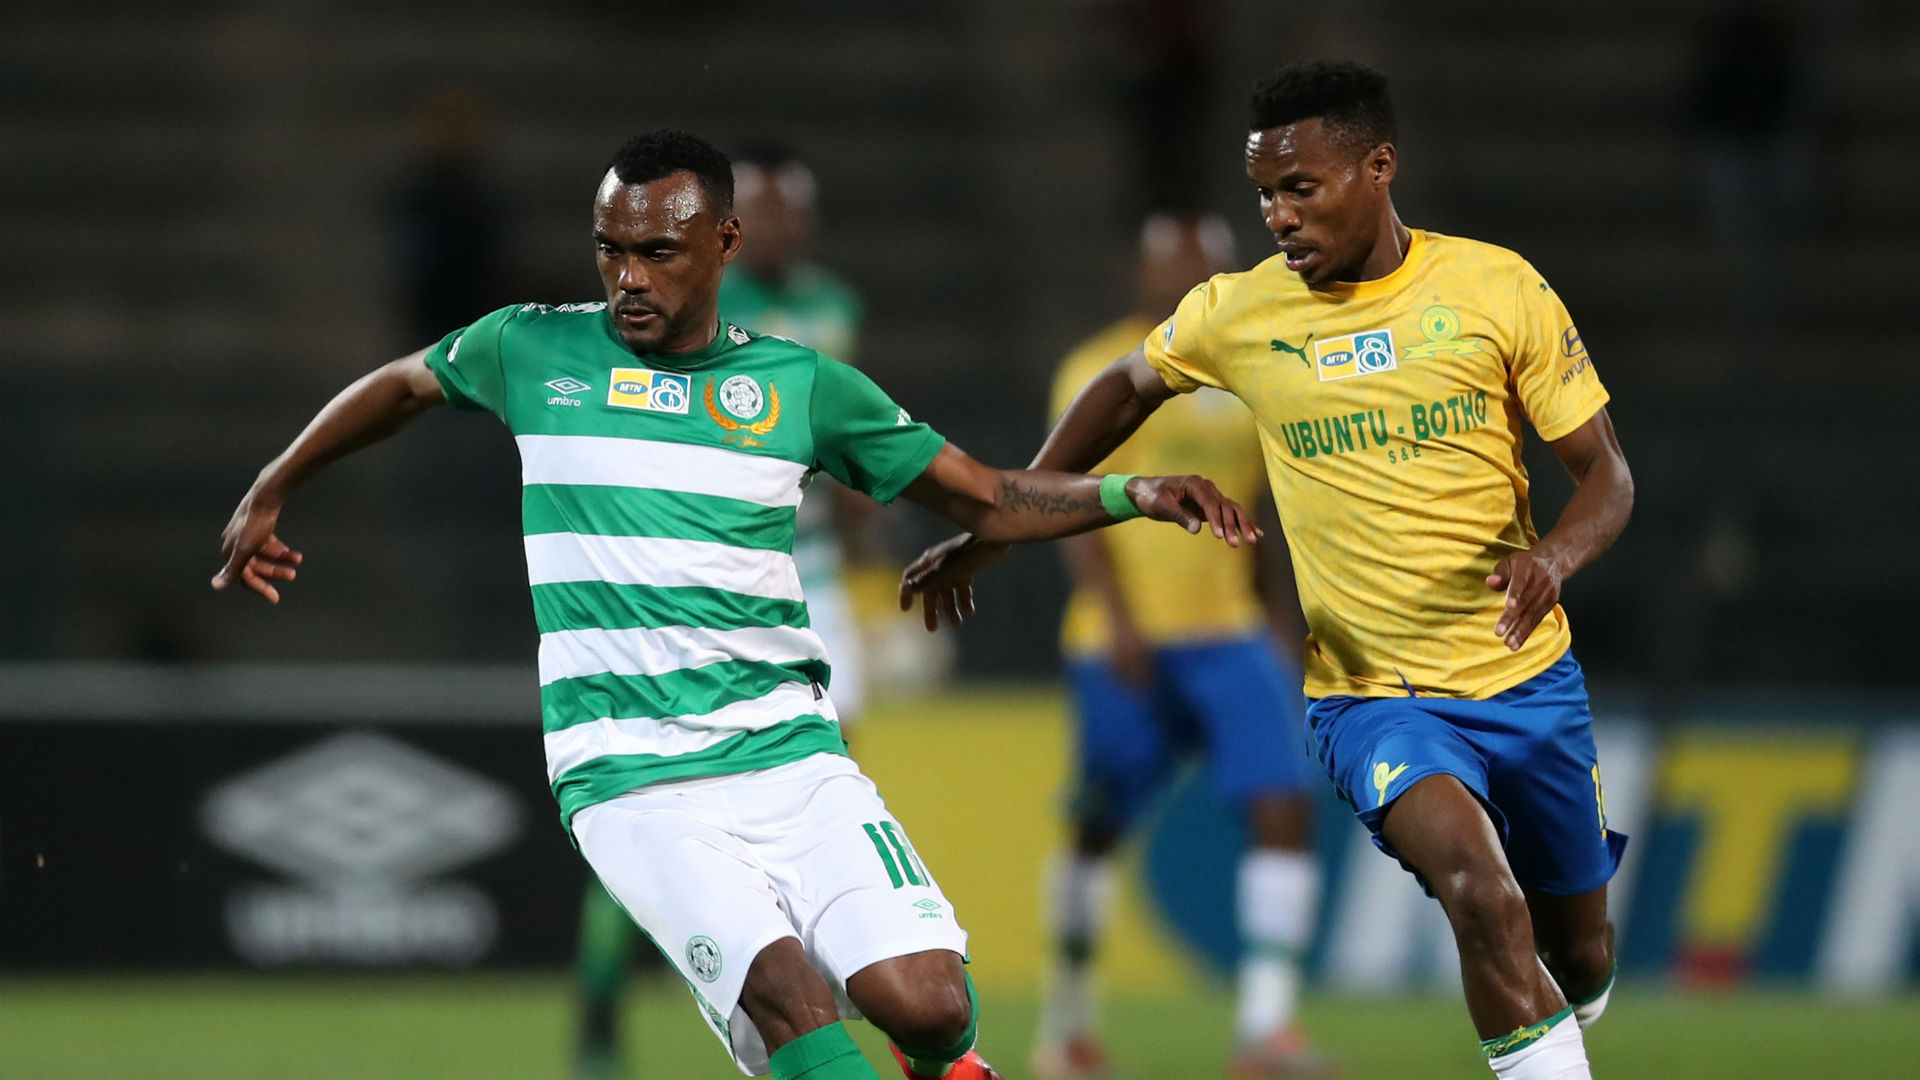 Nedbank Cup final 2020 : Bloemfontein Celtic vs Mamelodi Sundowns